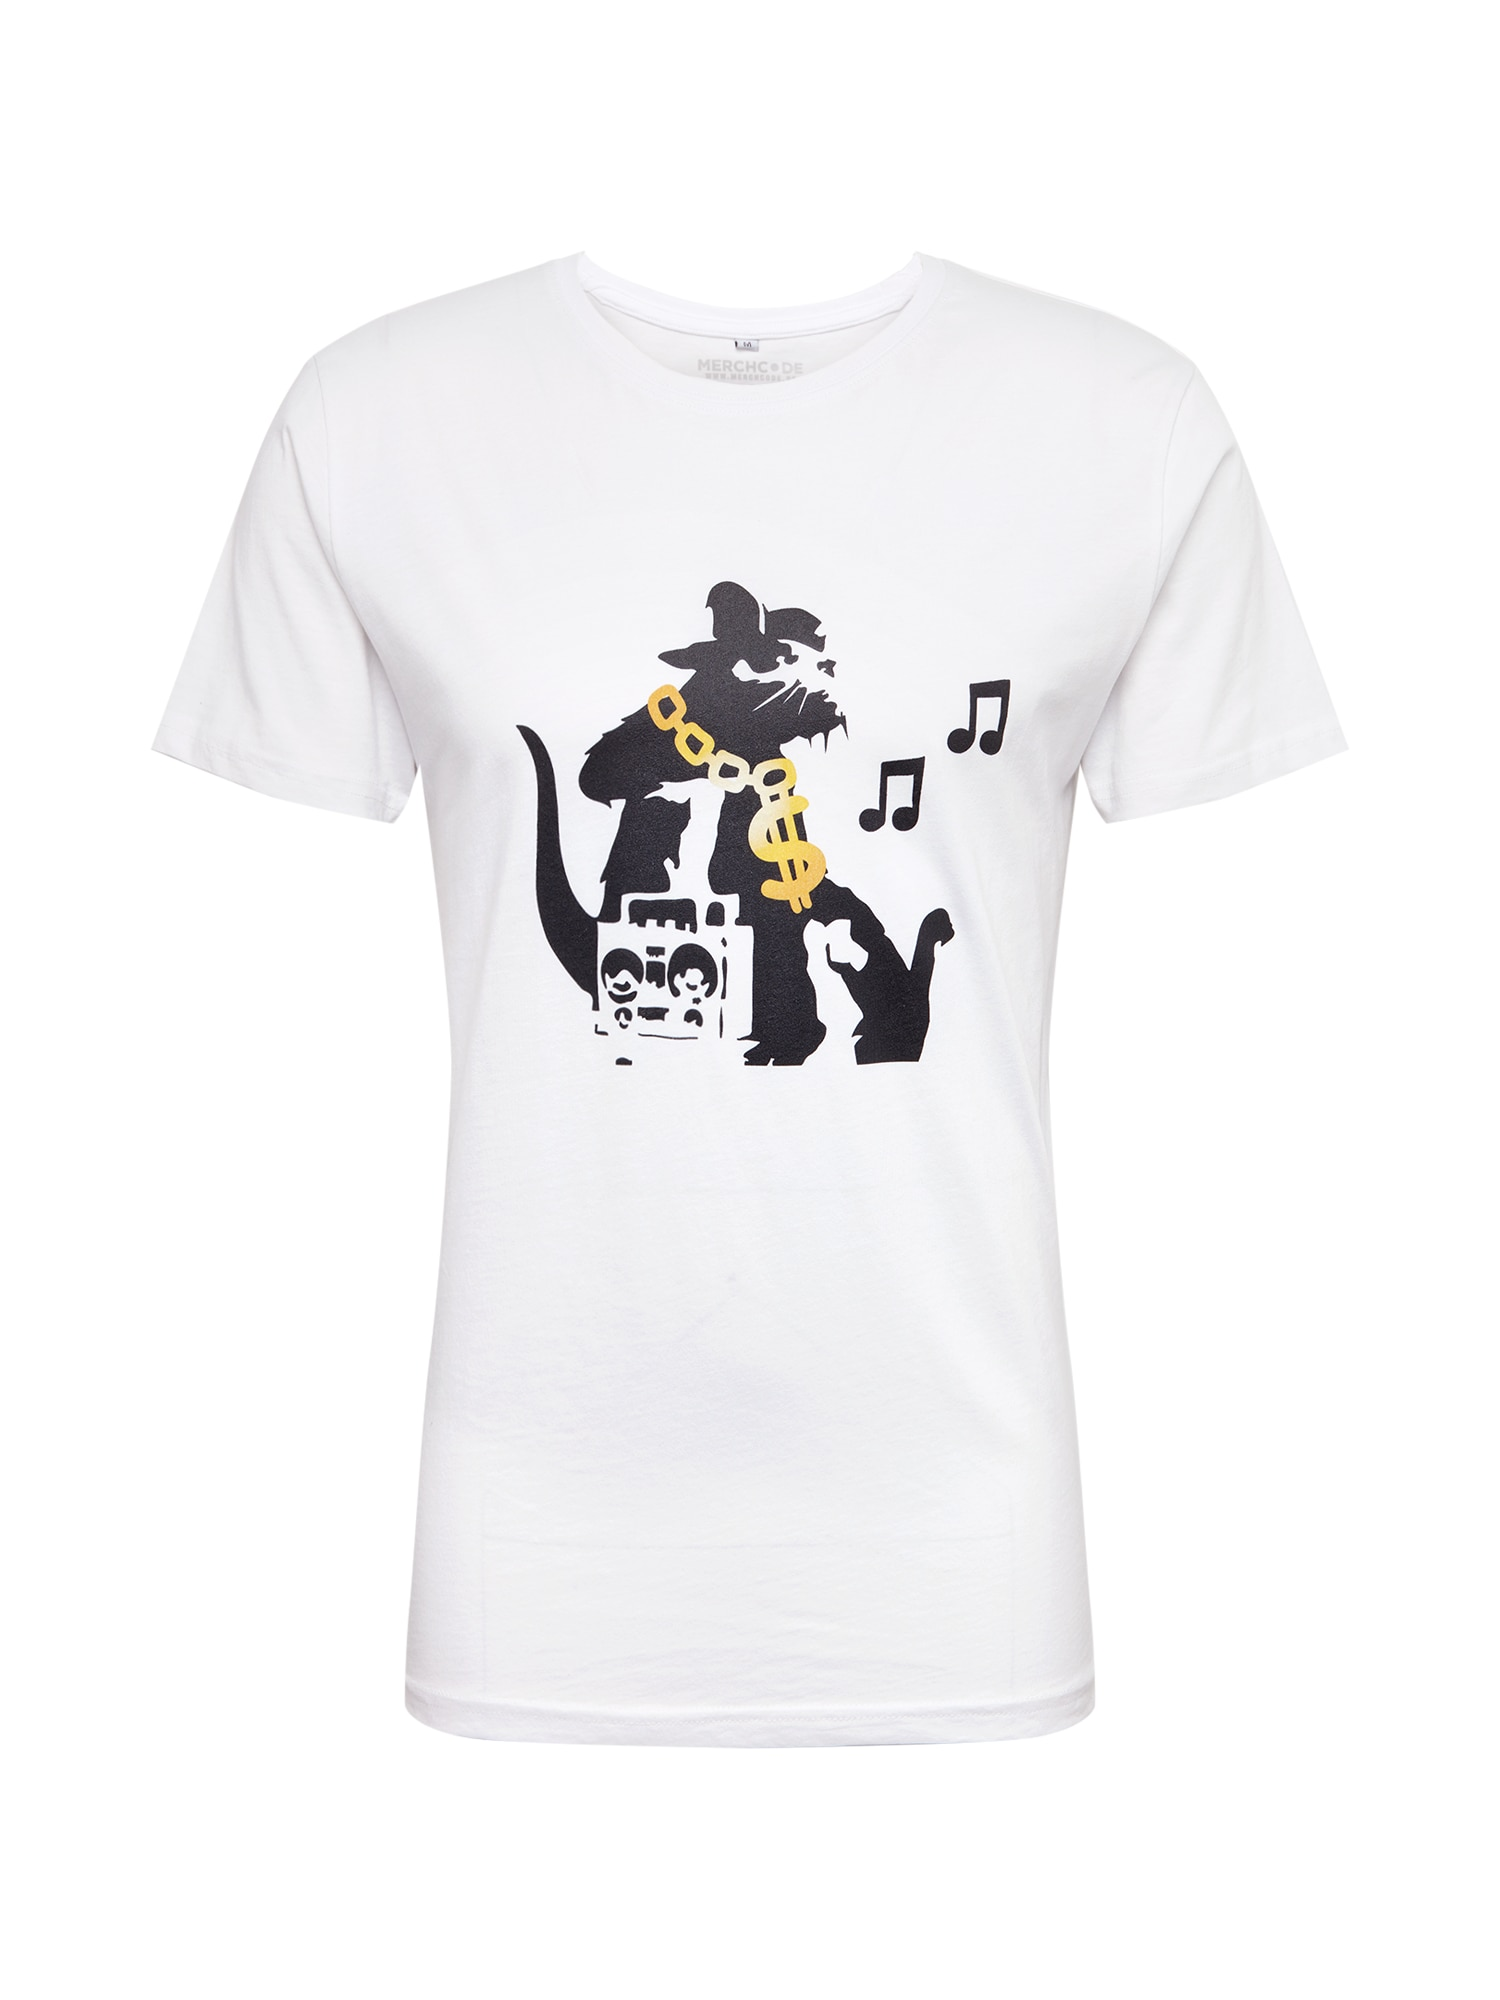 Tričko Banksy HipHop Rat Tee černá bílá Mister Tee